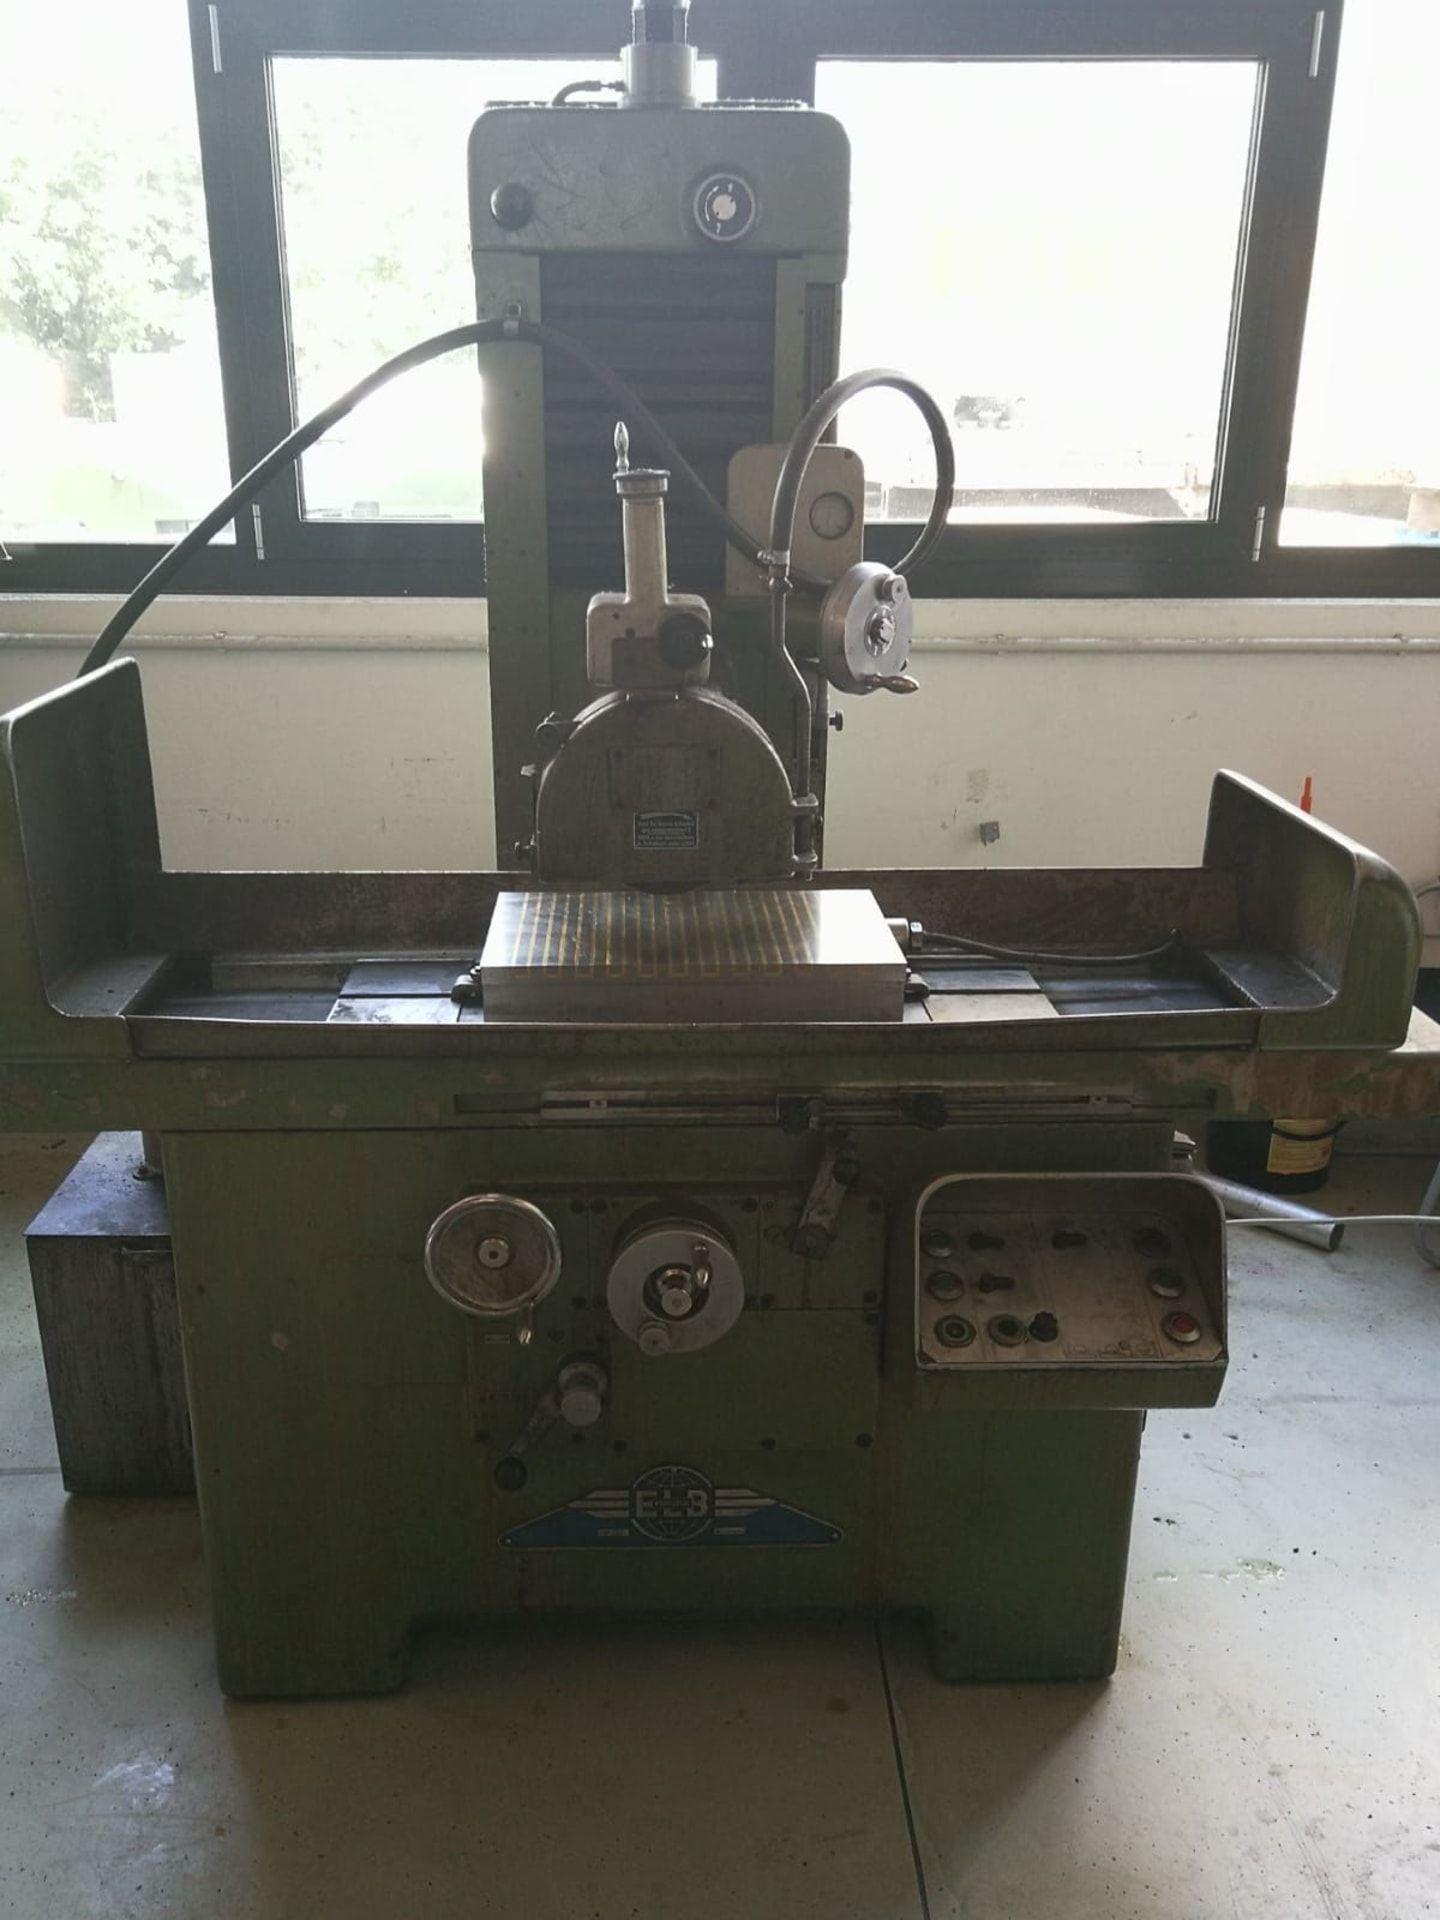 ELB SW 5 V 41 Flachschleifmaschine - DEFEKT